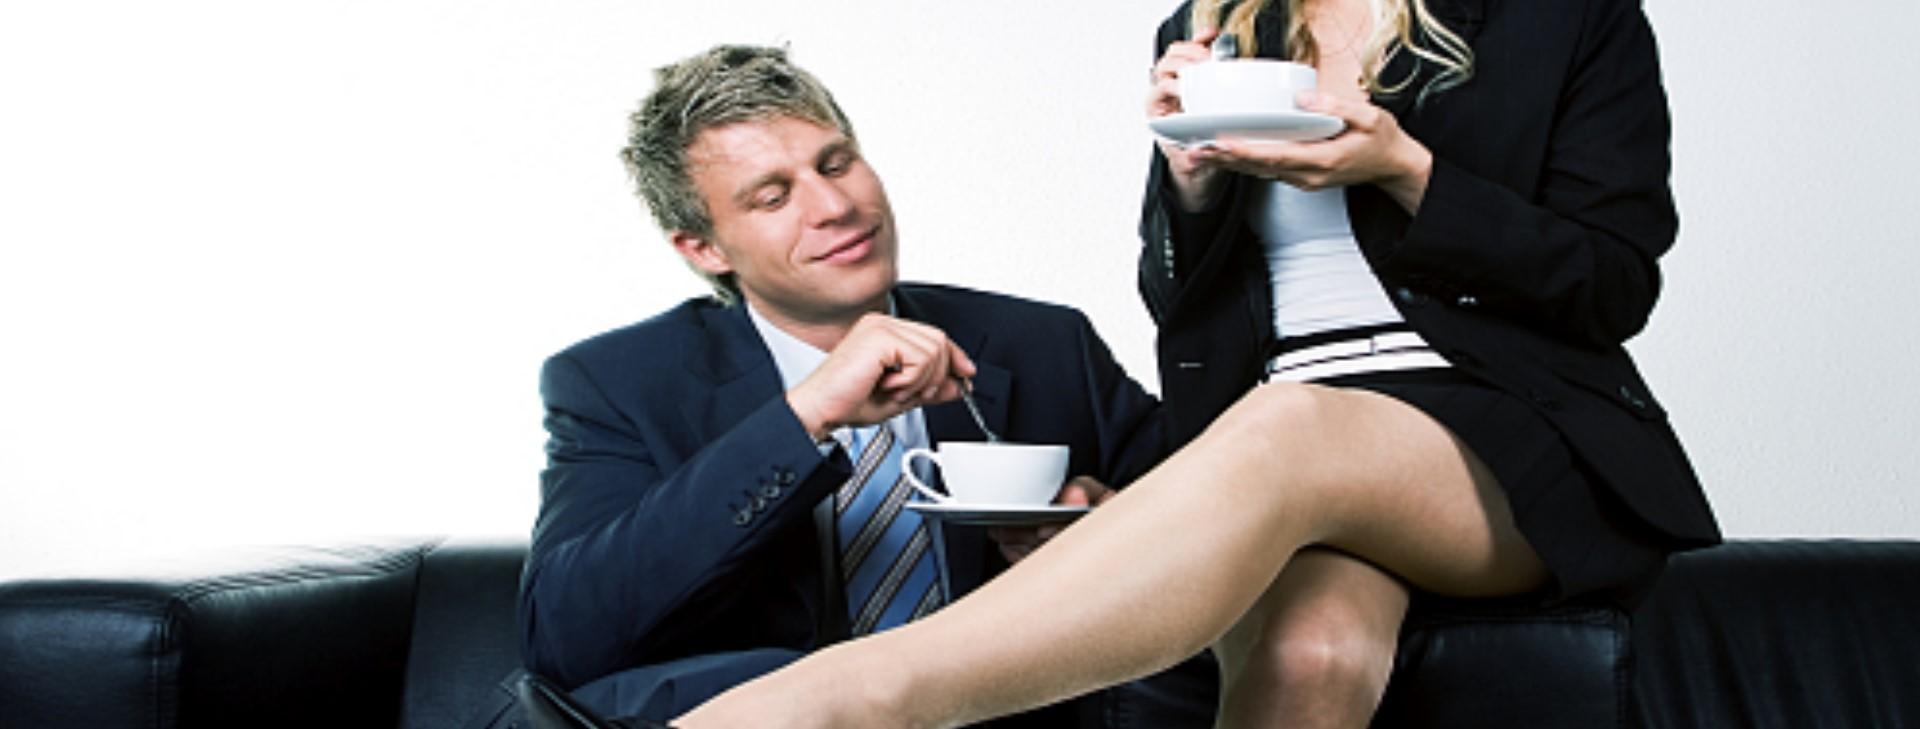 Frauen treffen per email